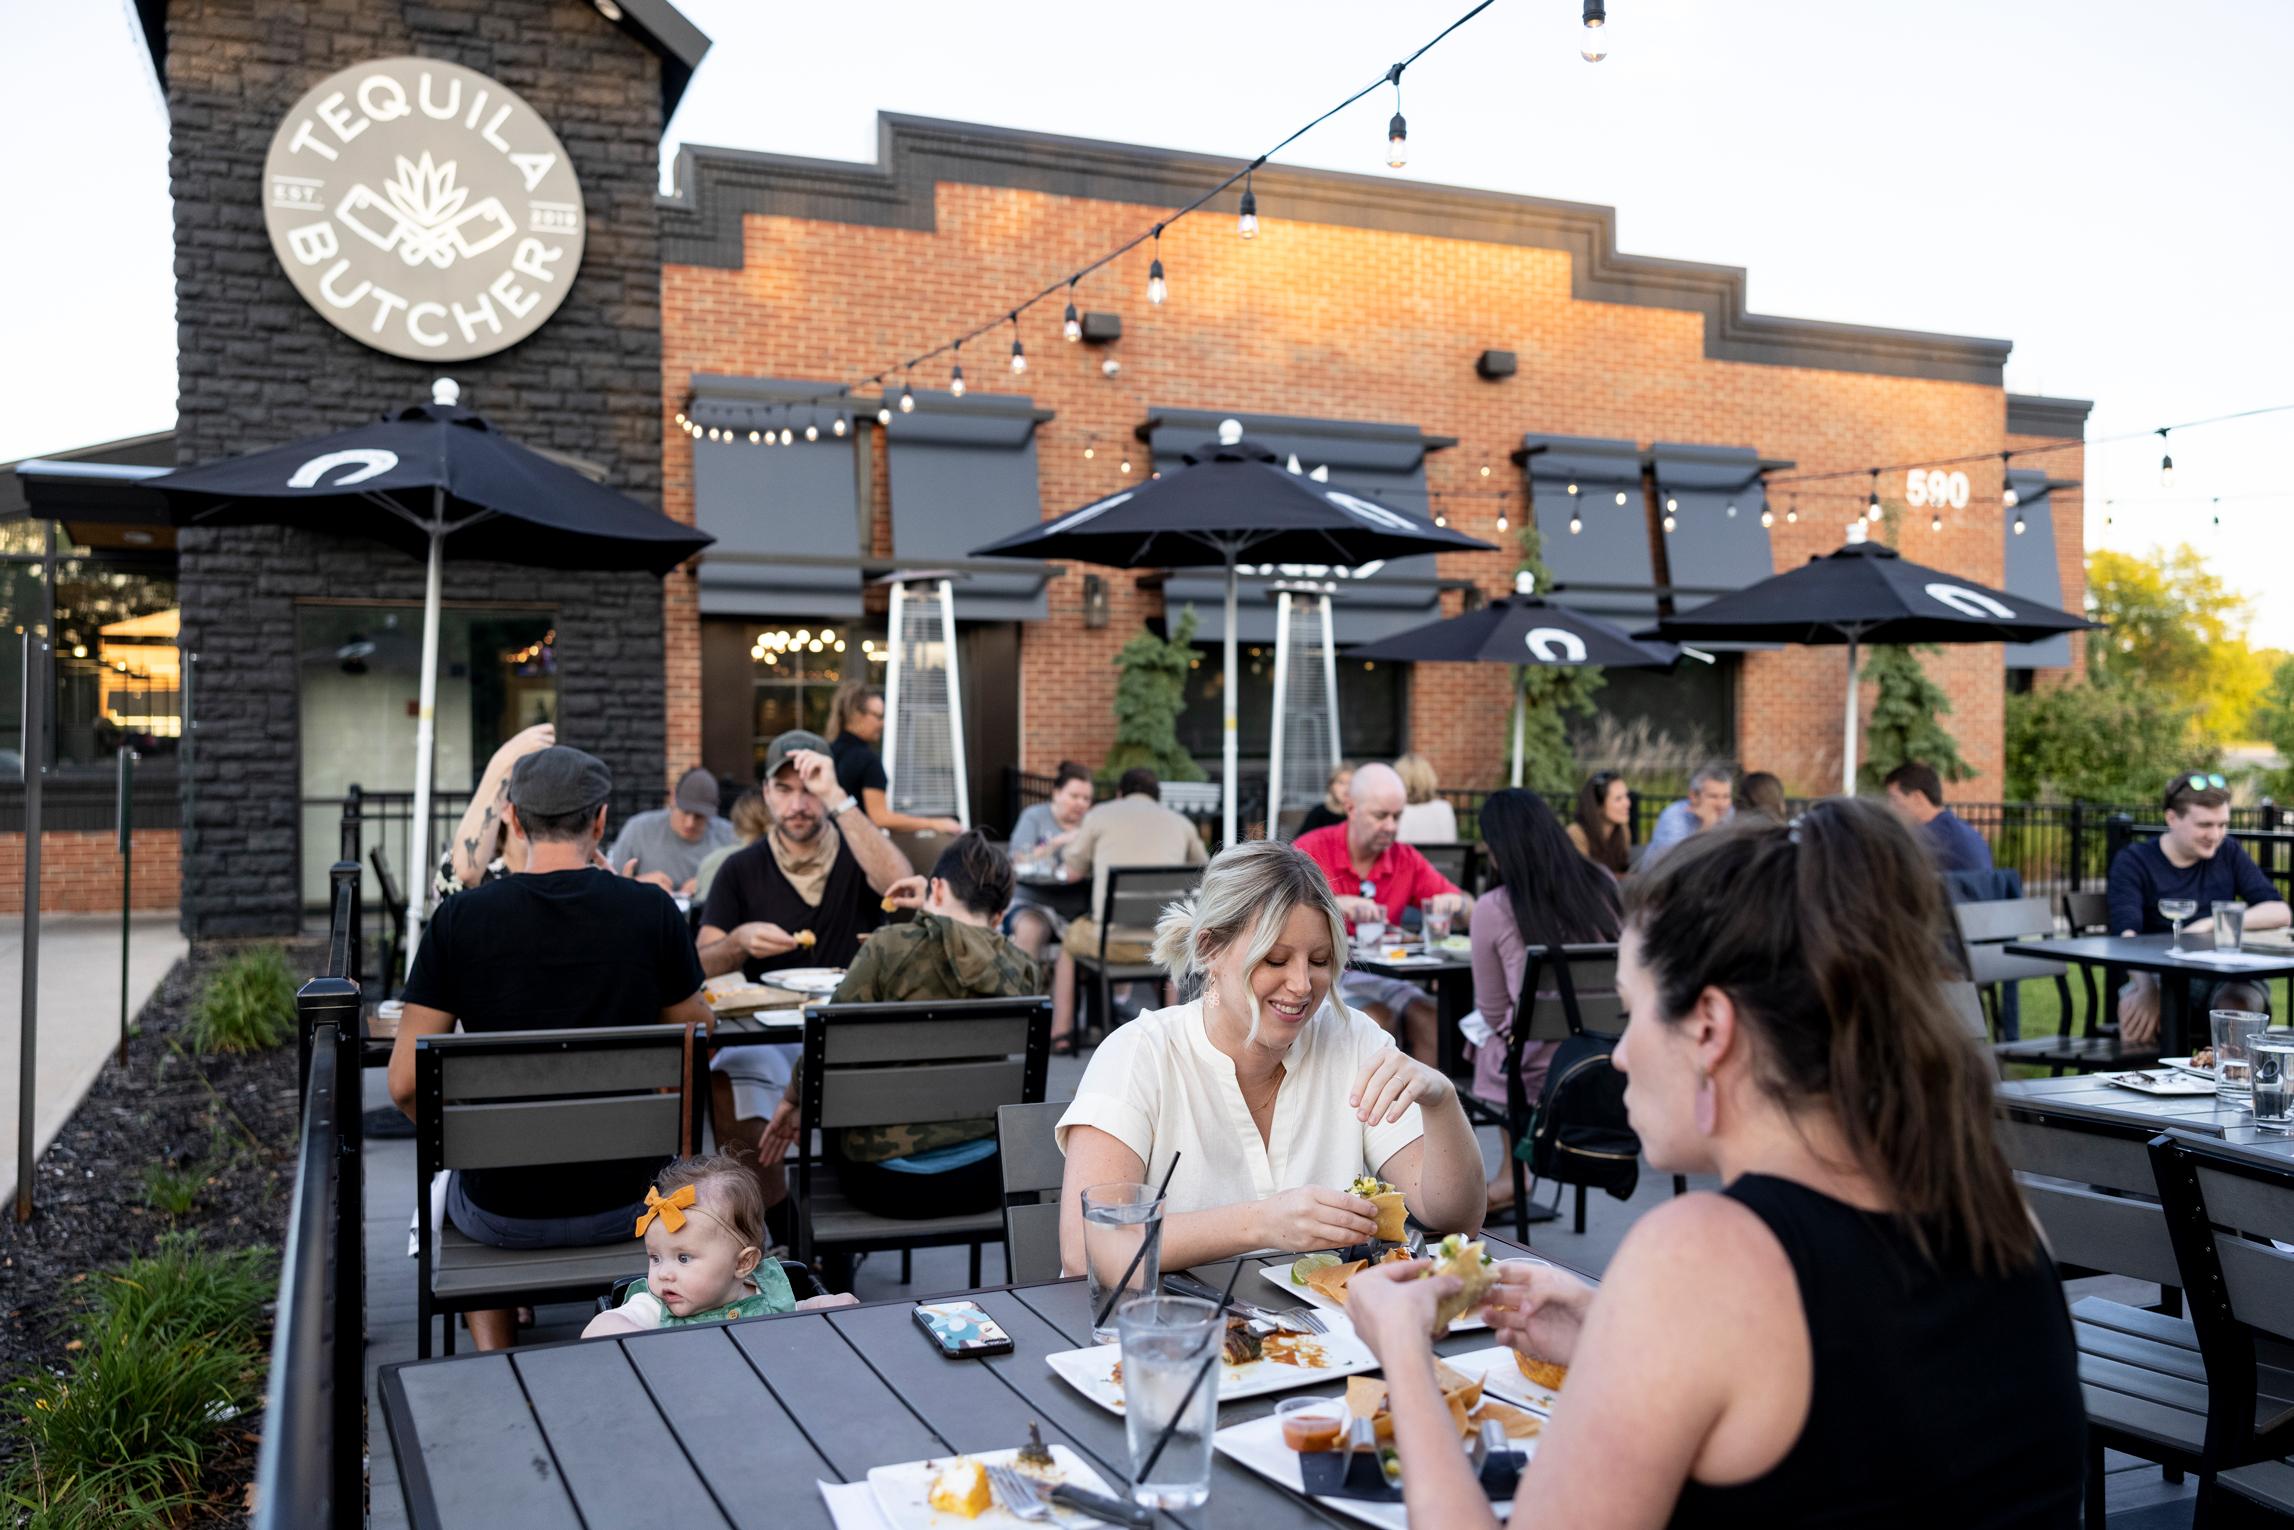 People eating at Tequila Butcher Restaurant in Chanhassen Minnesota